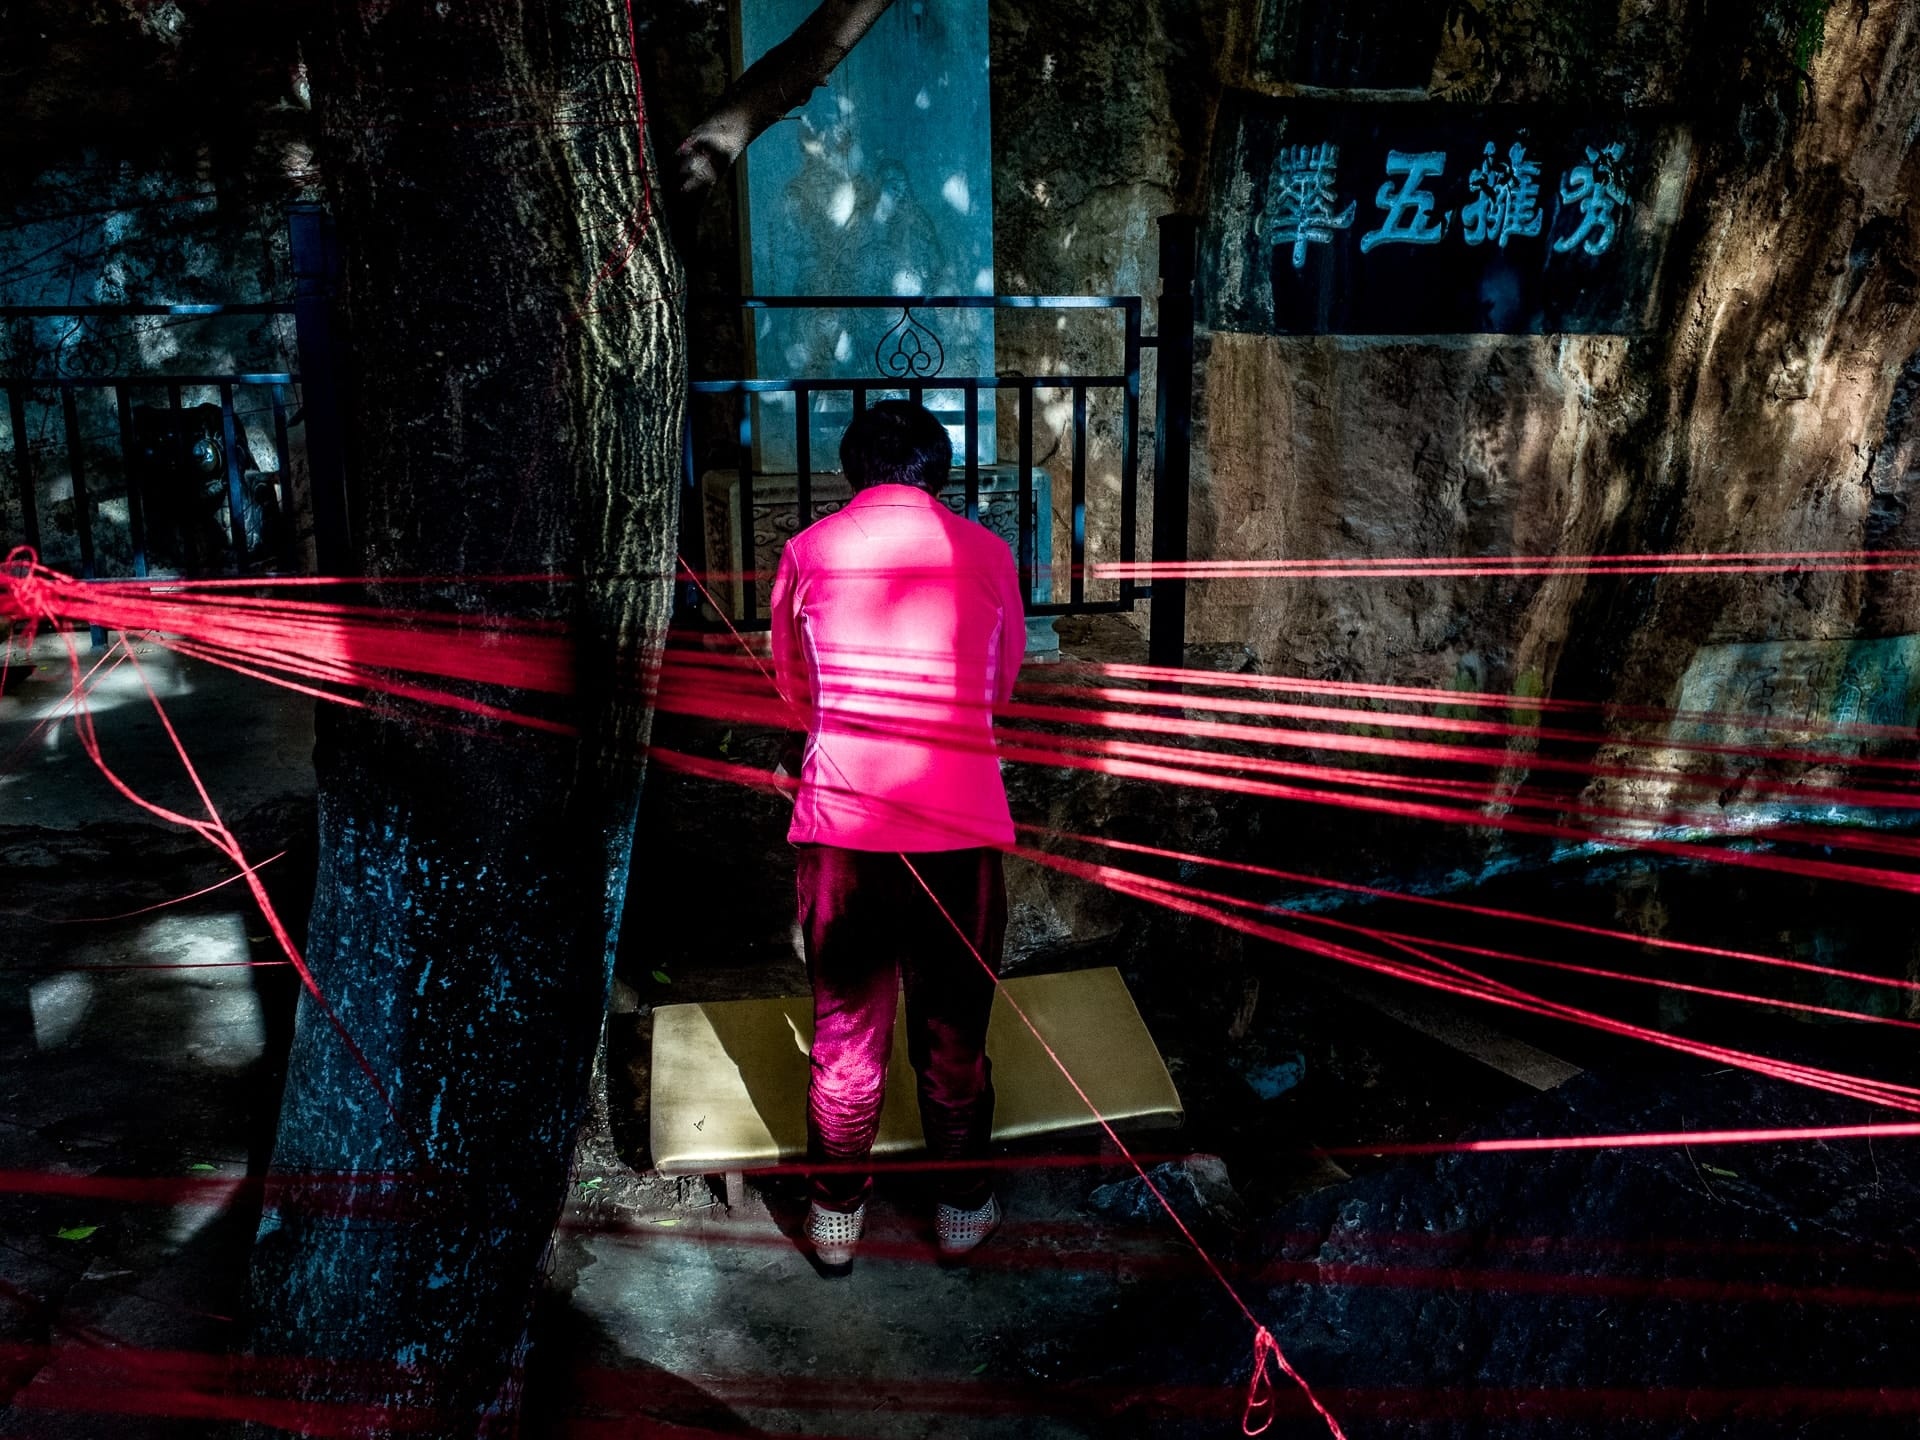 Tzen Xing colour pink contest winner